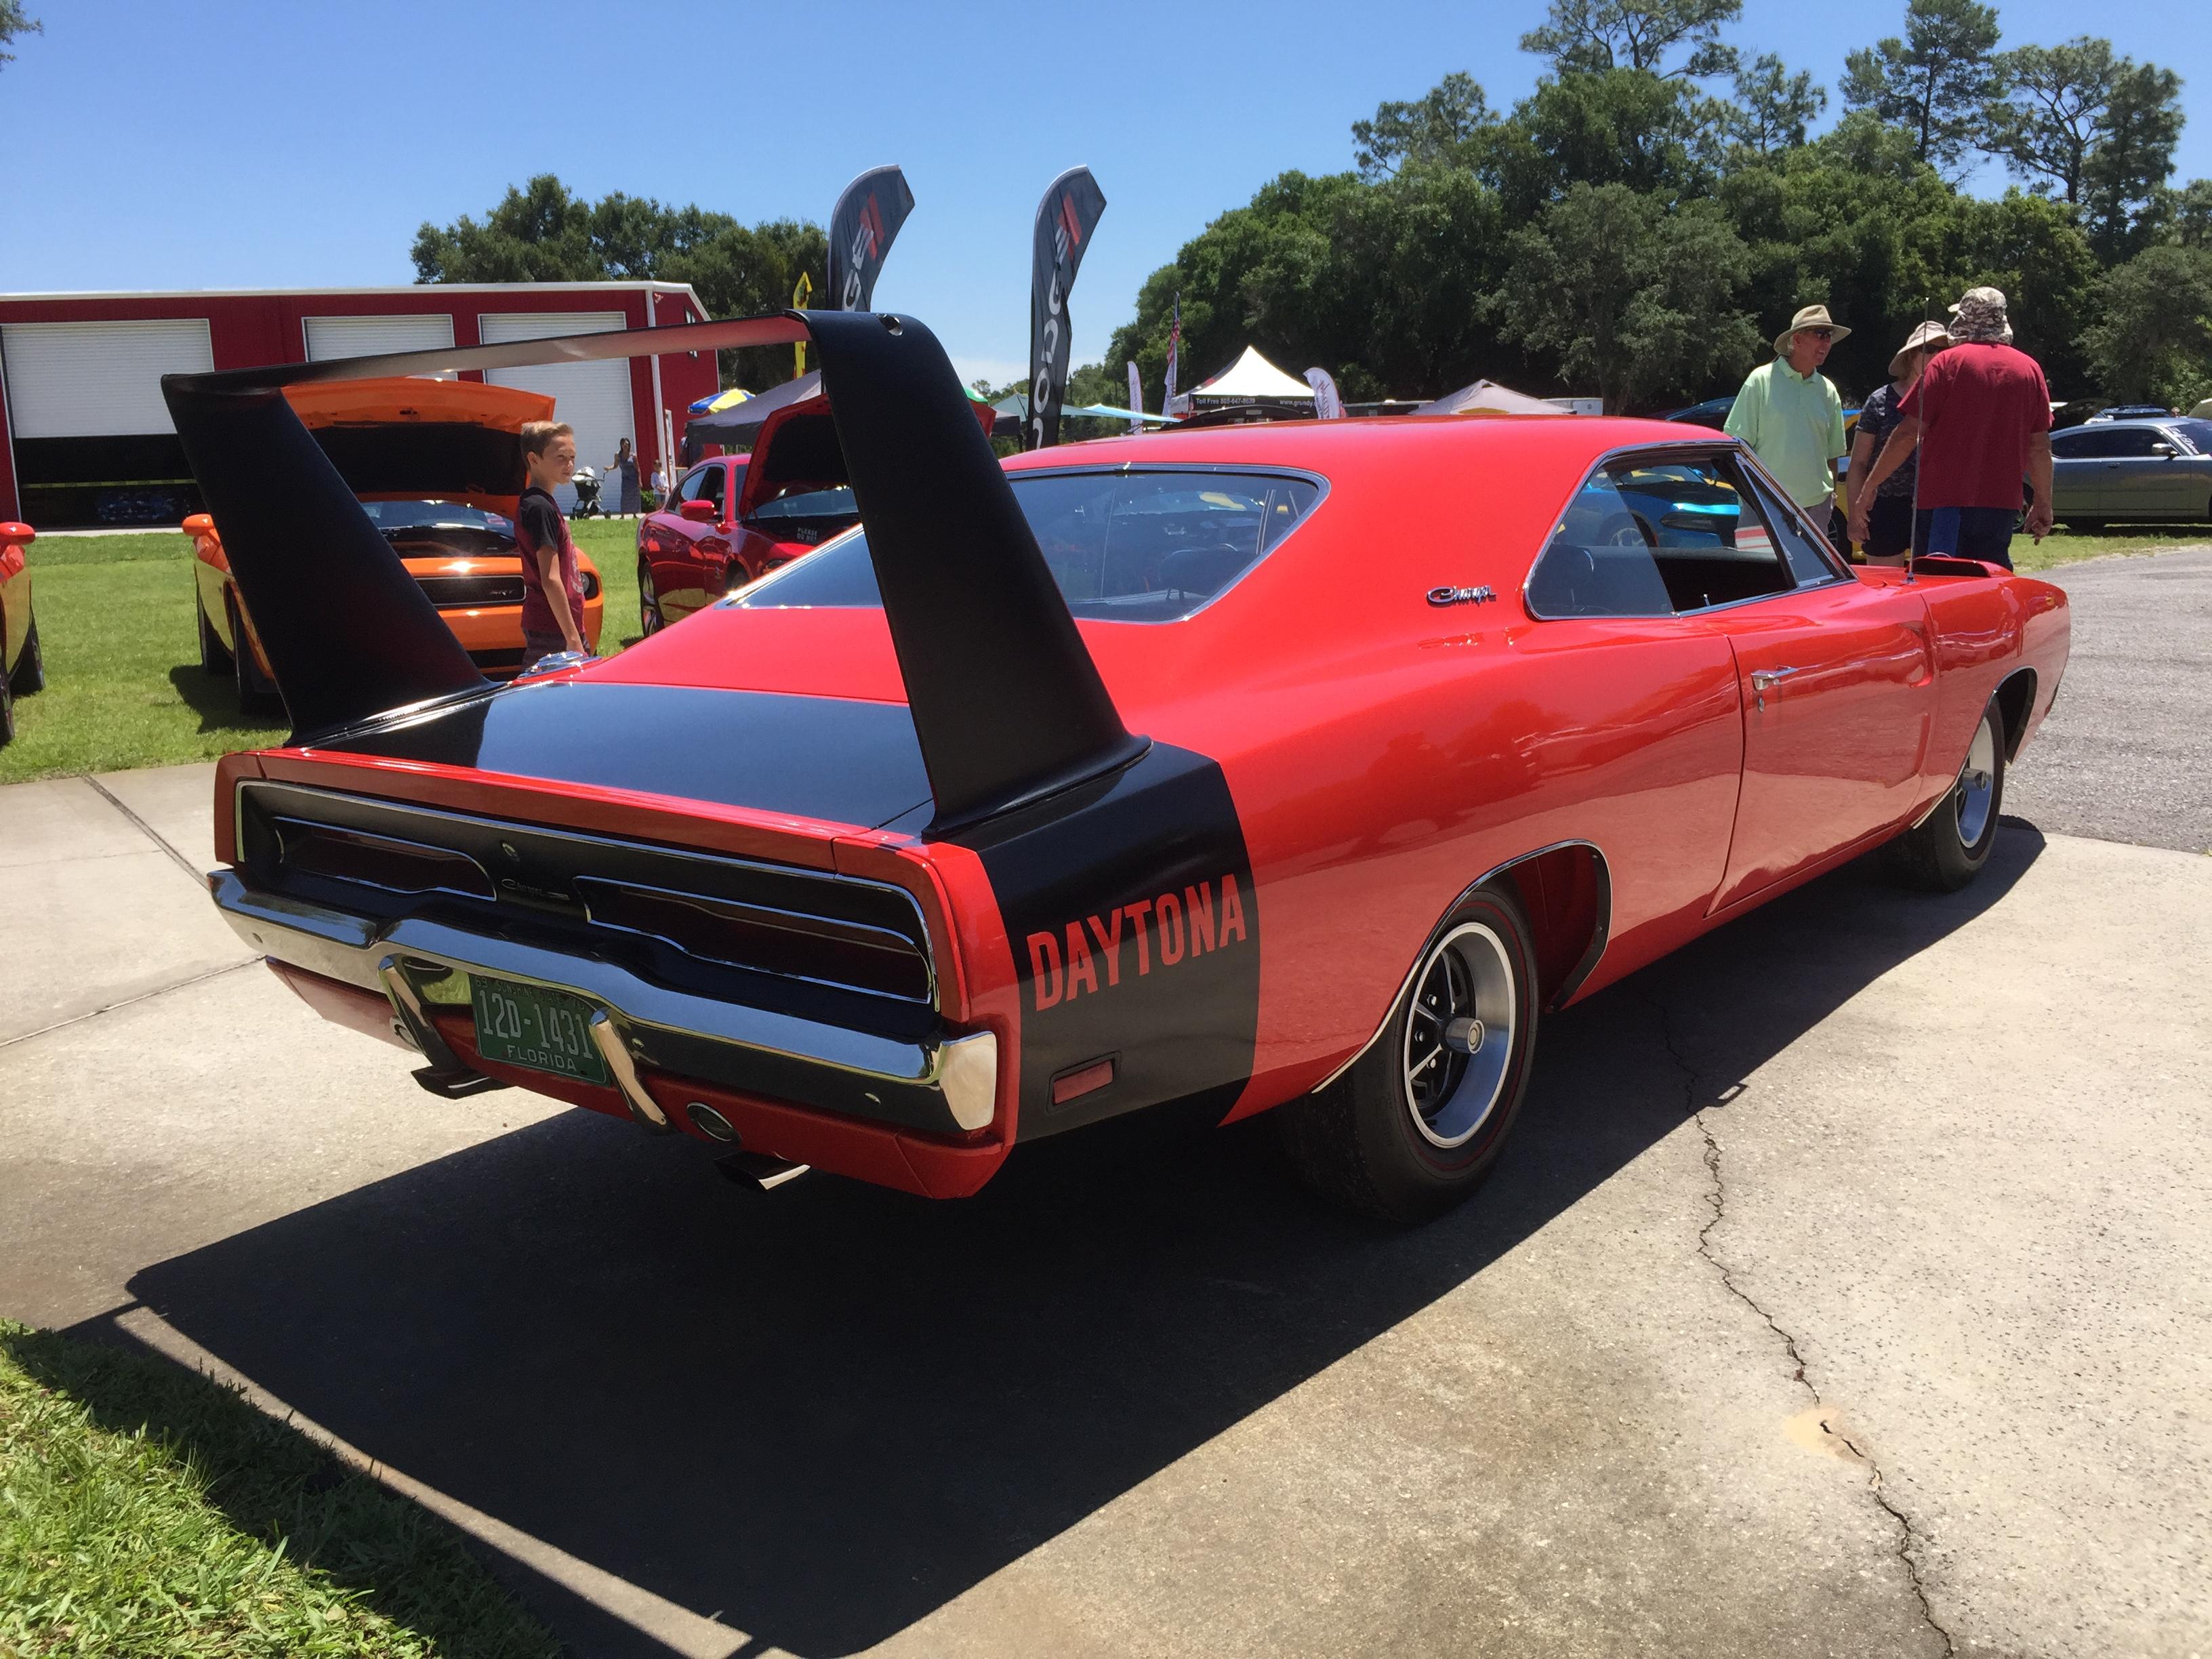 Mopar Only Car Show Central FL Horrsepower Ranch SRT Hellcat Forum - Where is the car show today